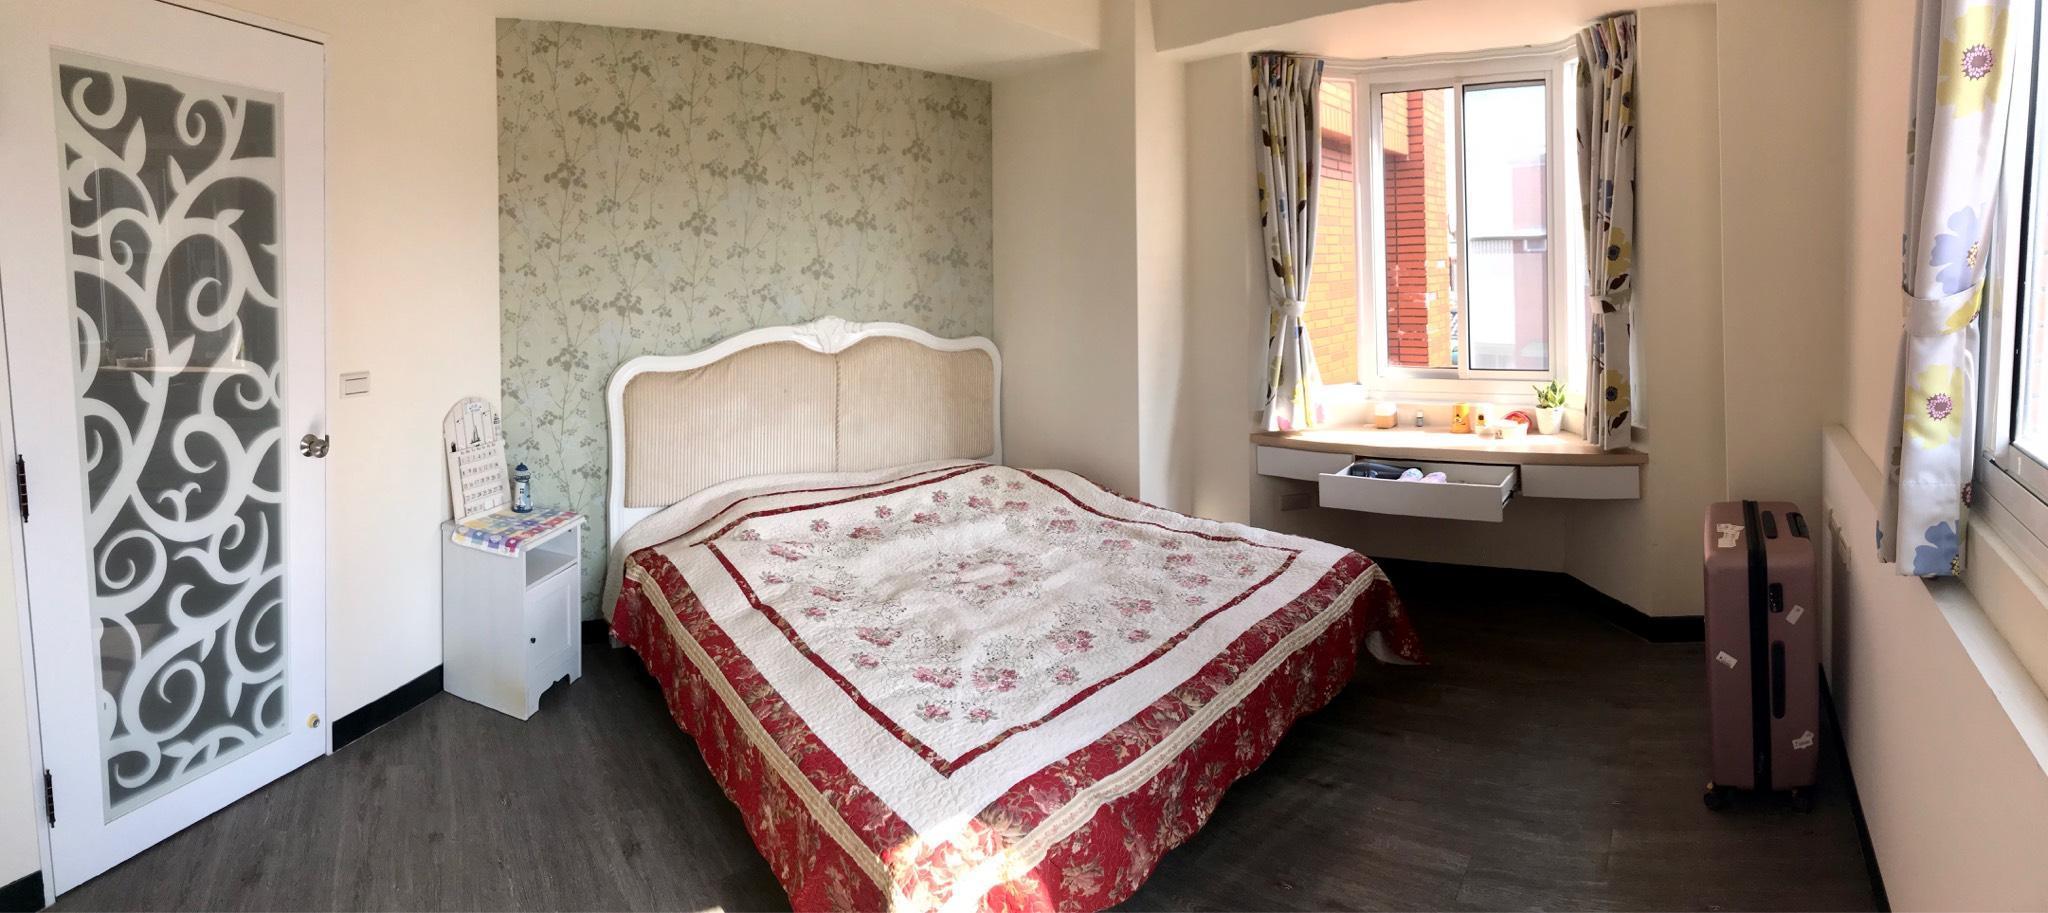 Chiayi Alishan Yongchun Apartment Homestay 601